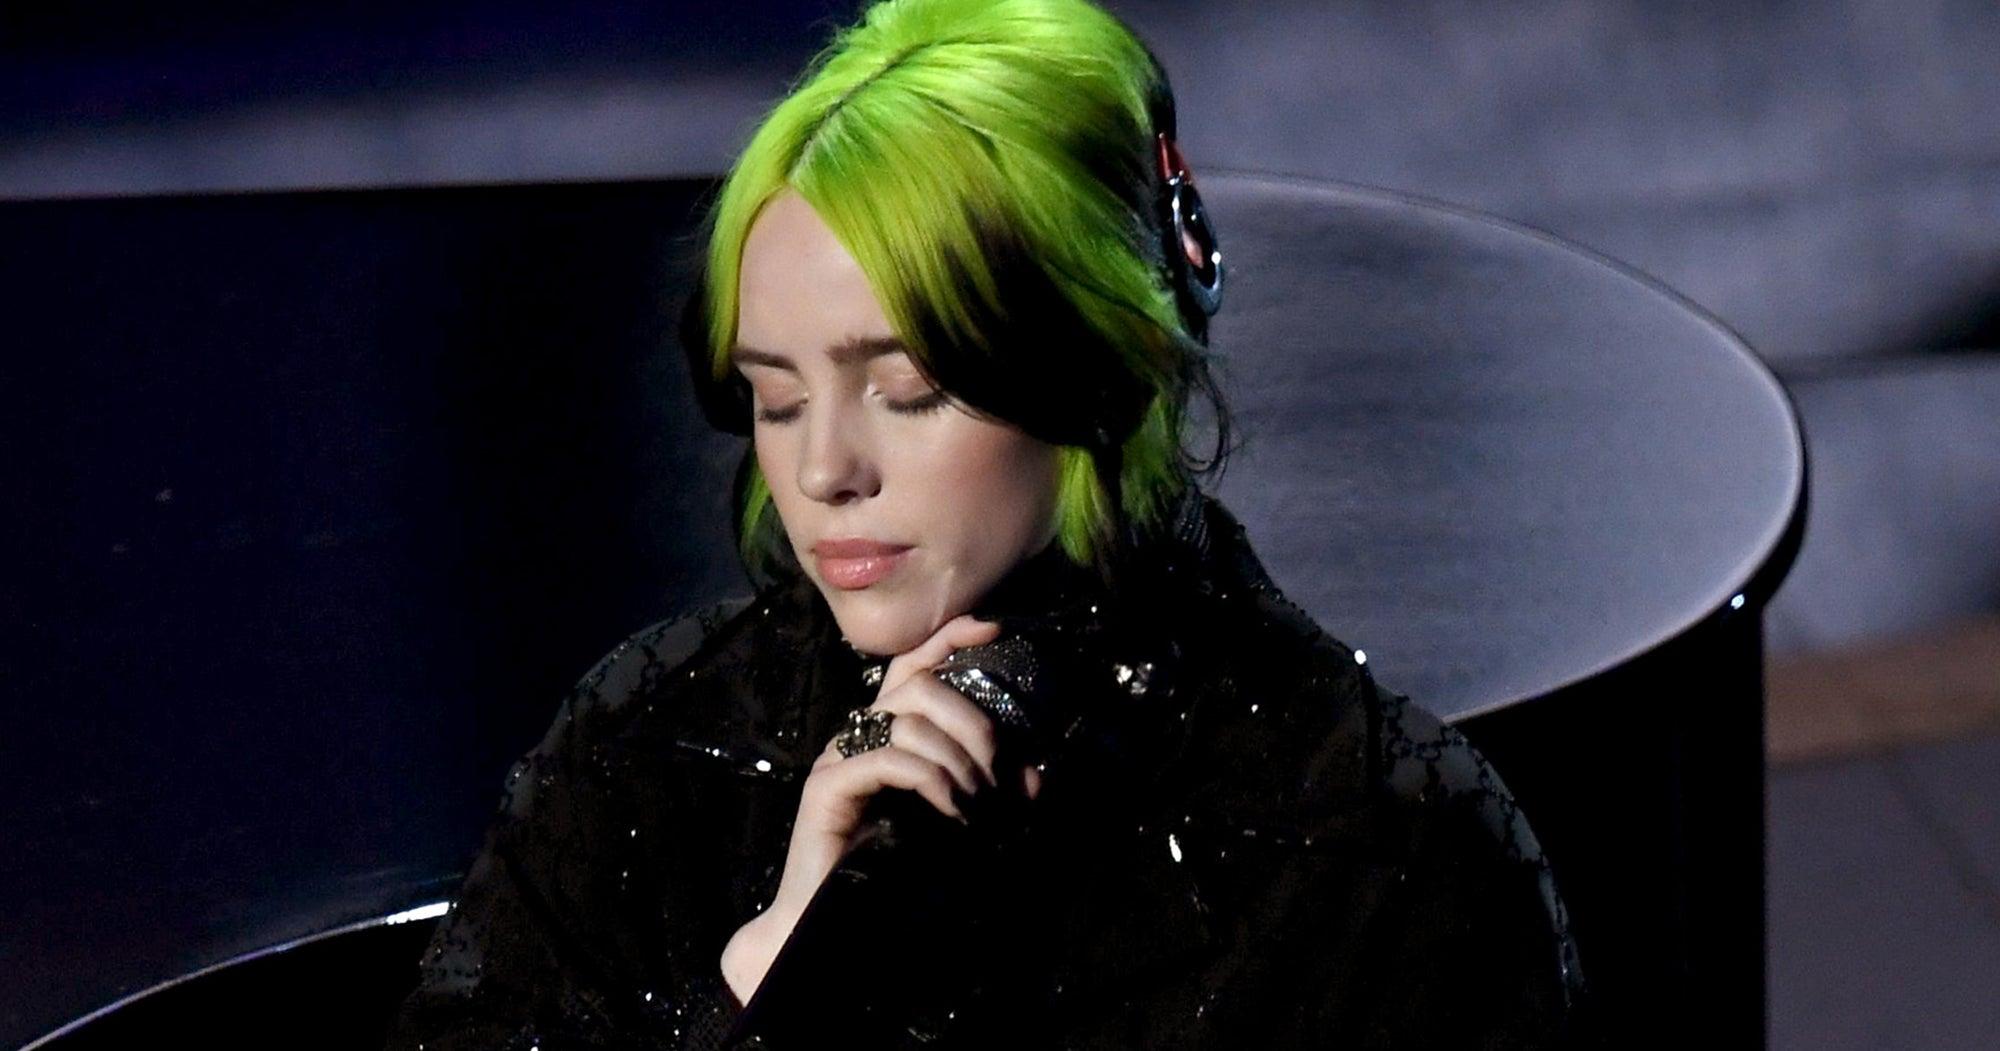 Billie Eilish Says She Had A Pretty Terrible Time At The Oscars